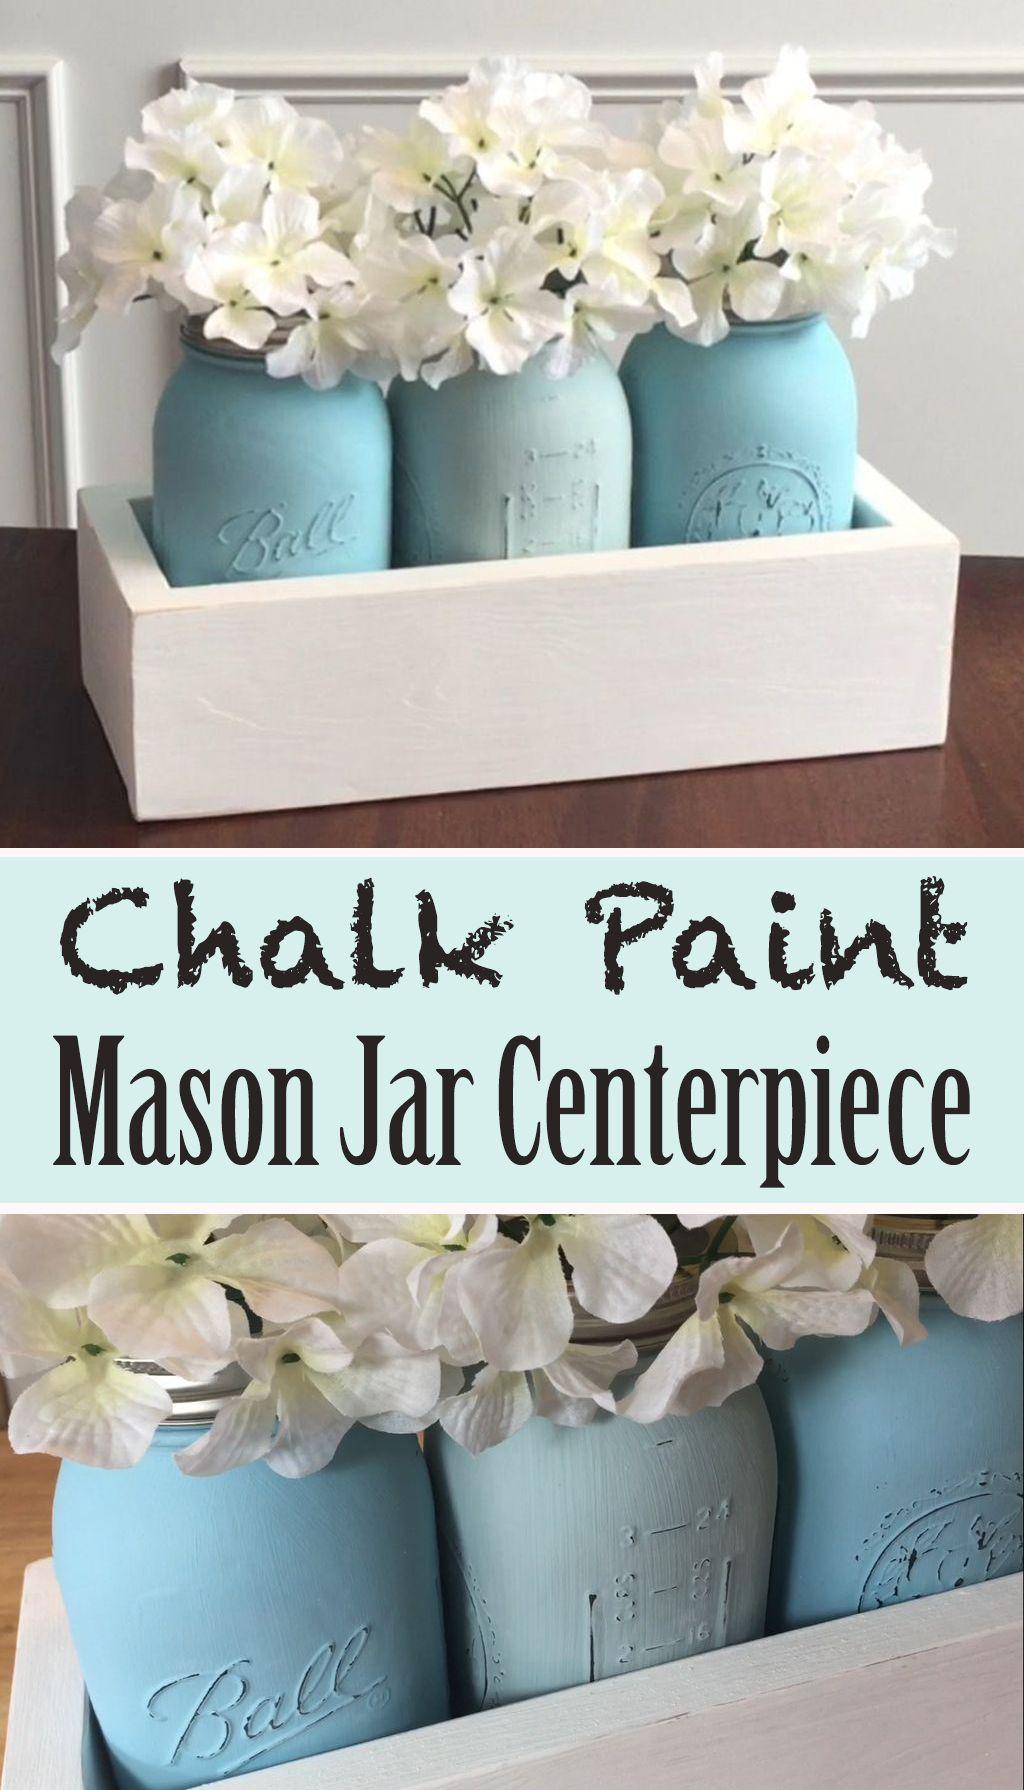 Chalk paint mason jar centerpiece window sill window and easy